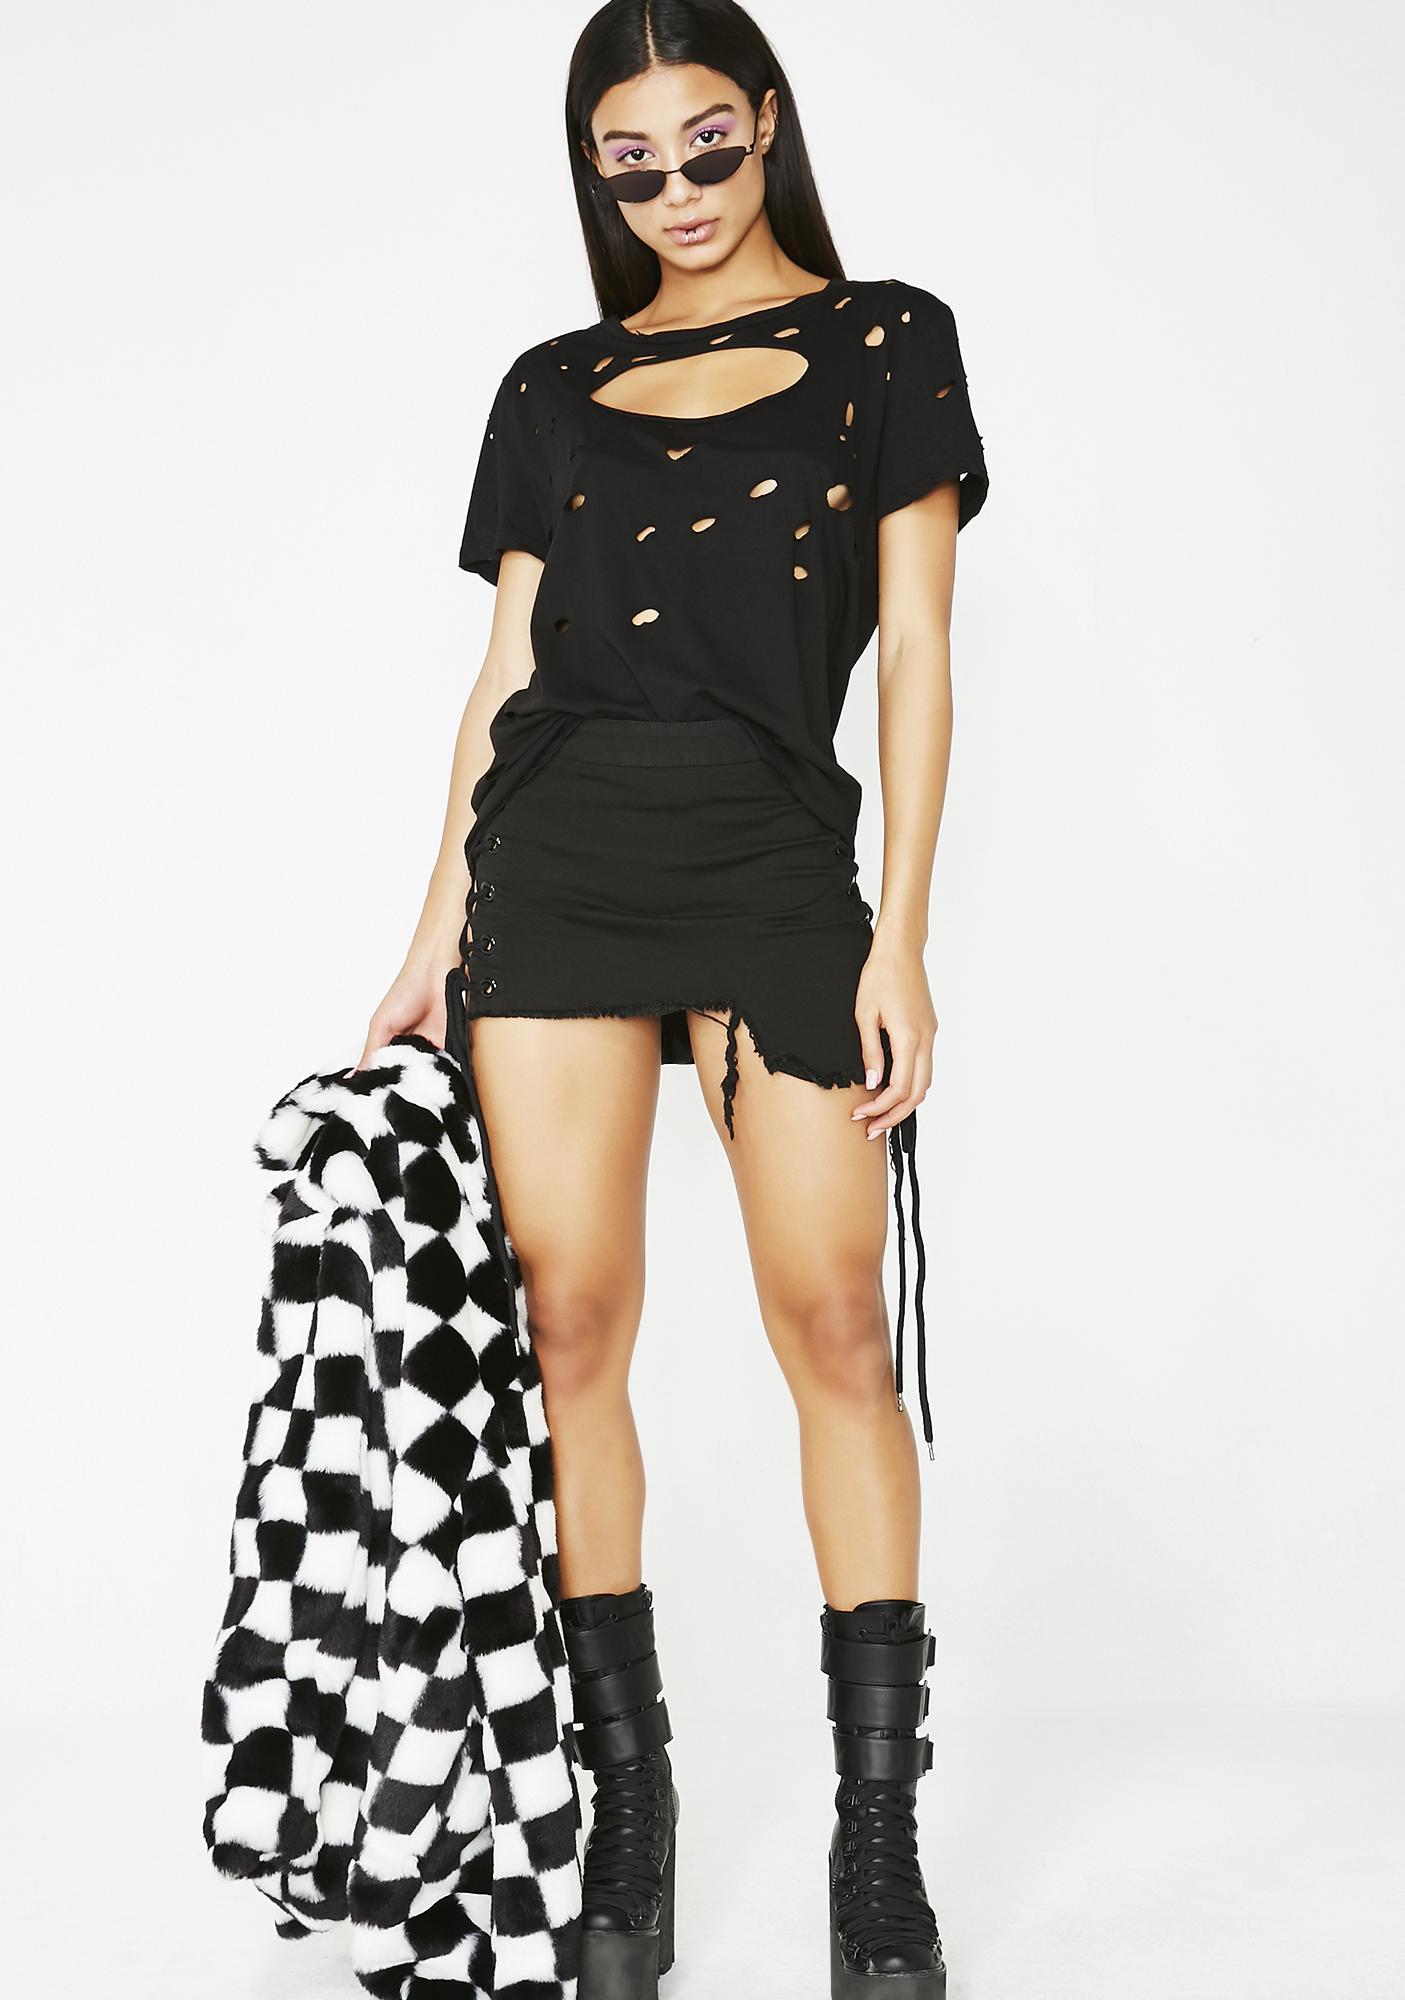 Kiki Riki Double Life Lace Up Skirt